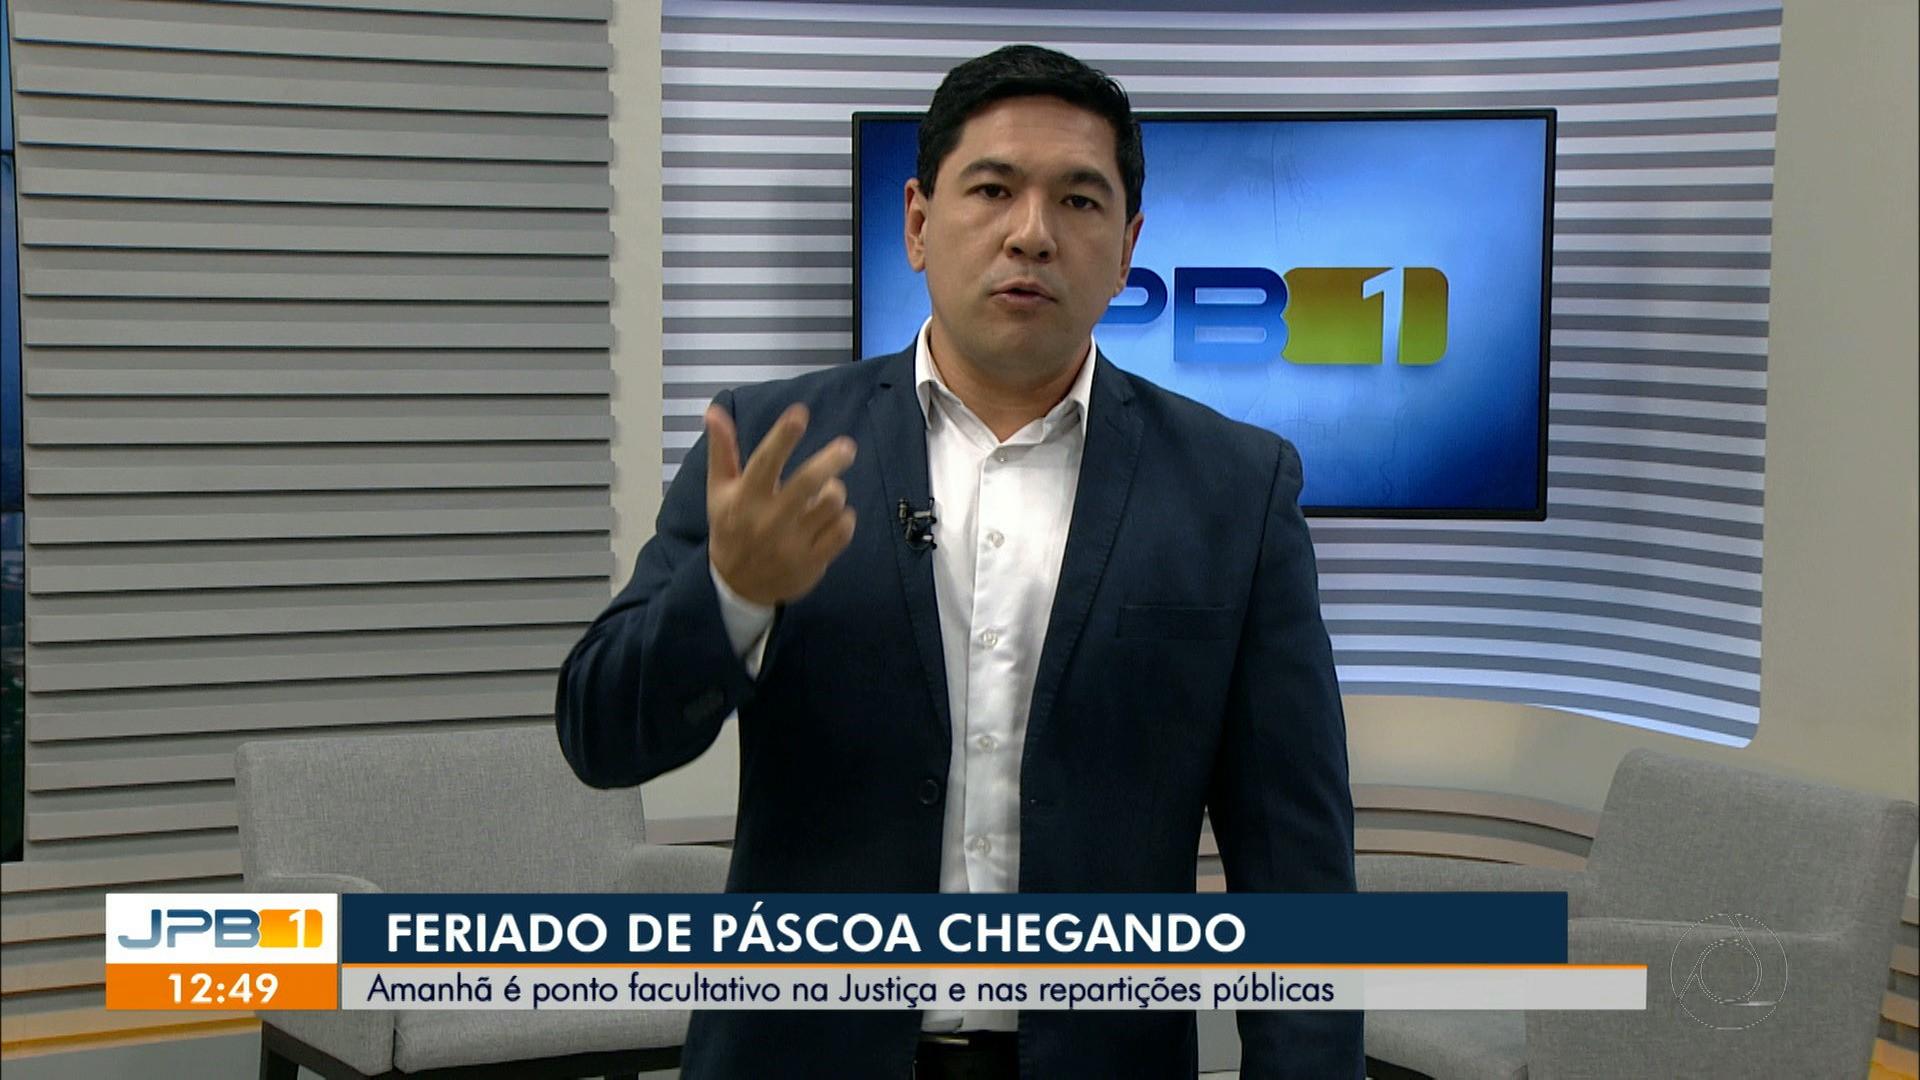 VÍDEOS: JPB 1 (TV Cabo Branco) desta quarta-feira, 17 de abril